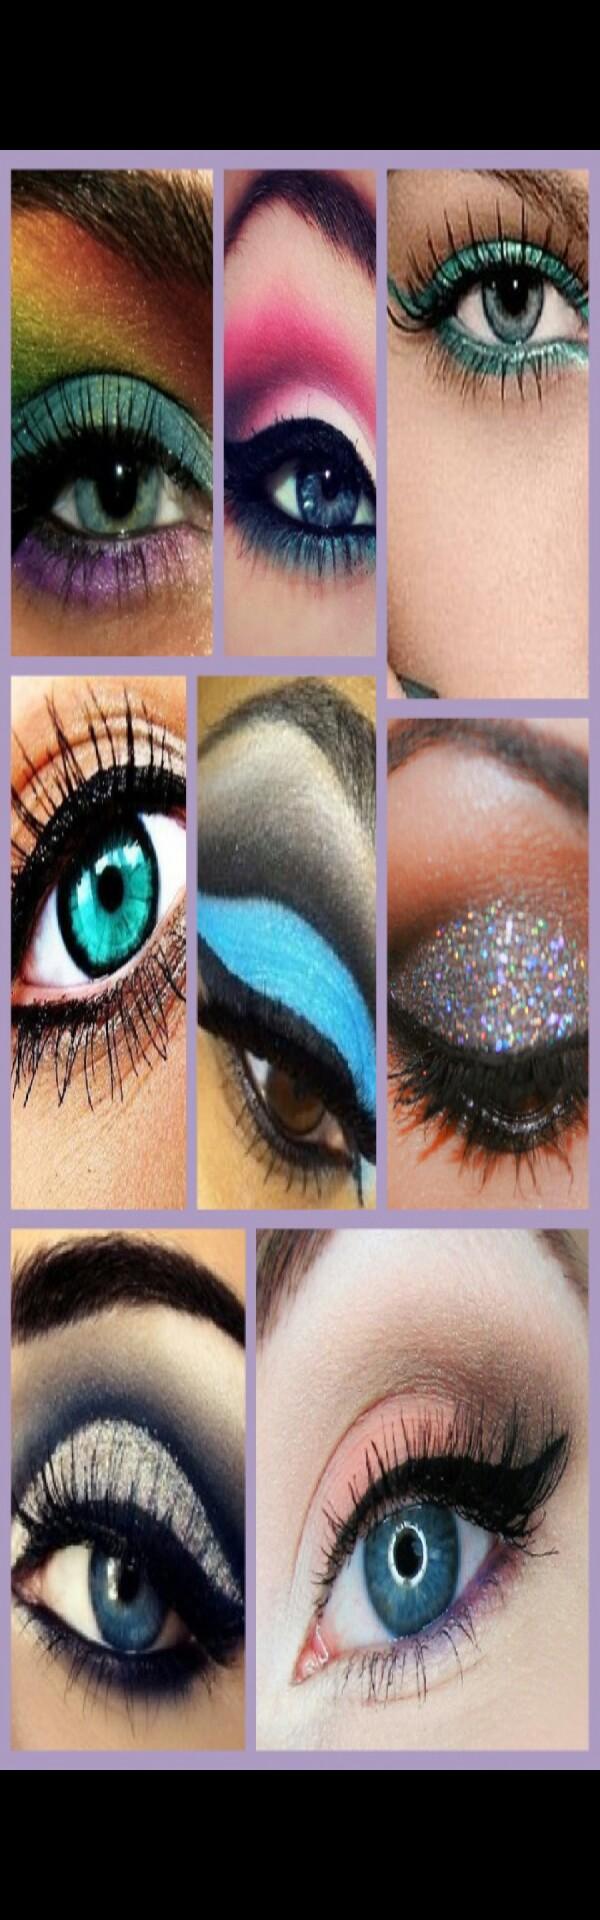 Makeup Tips And Nail Art Hope You Guys Like It